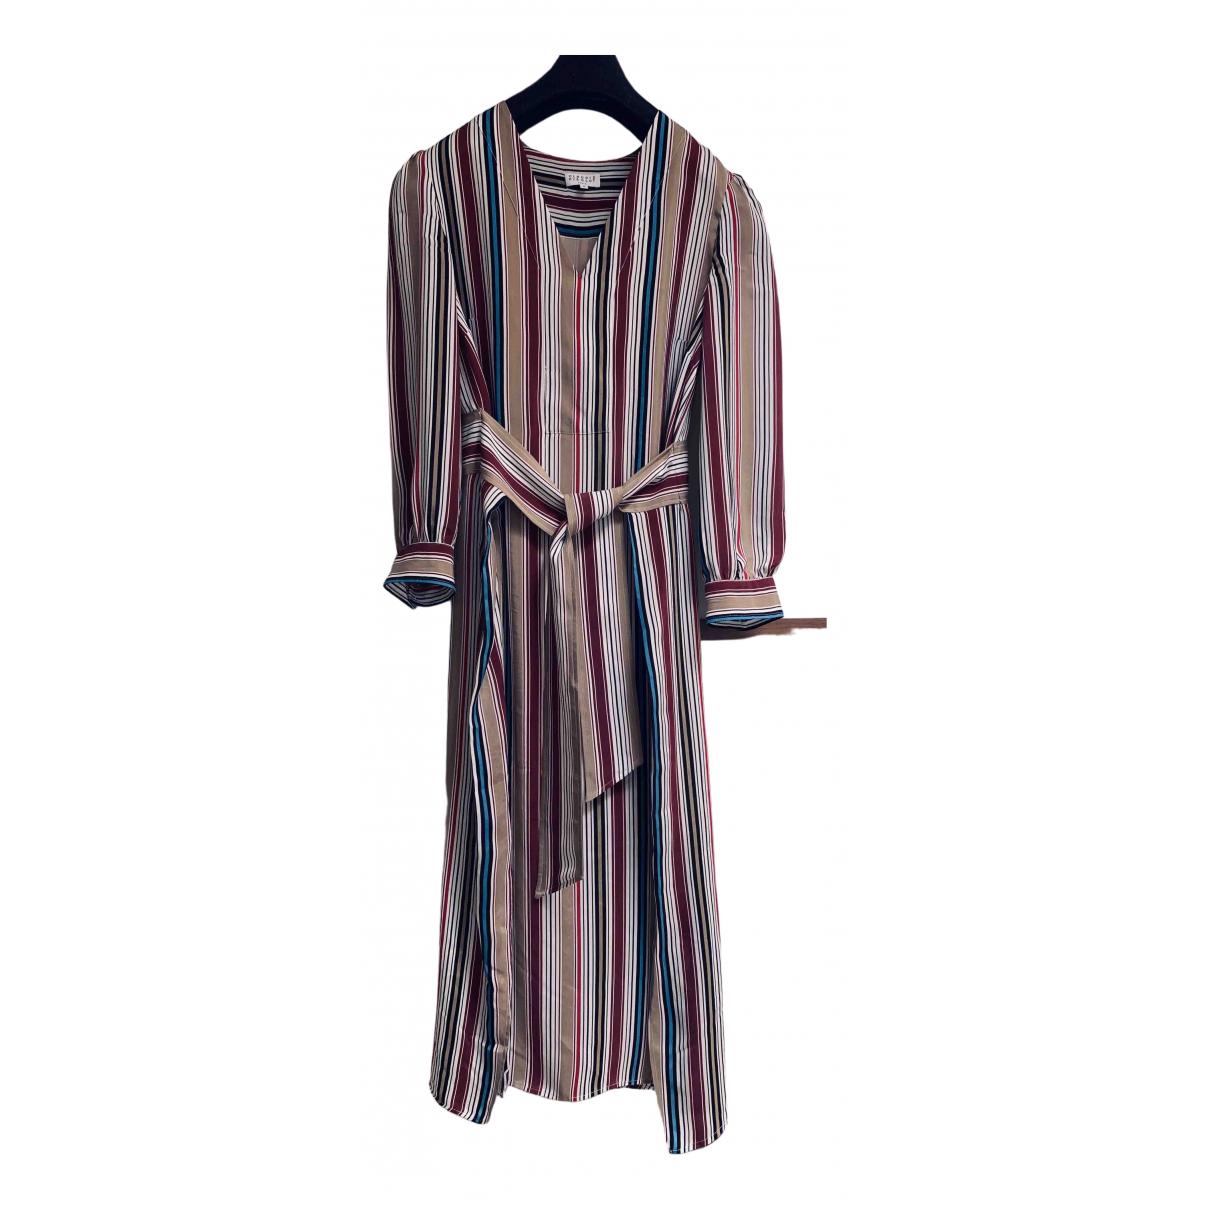 Claudie Pierlot Spring Summer 2020 Kleid in  Bunt Polyester